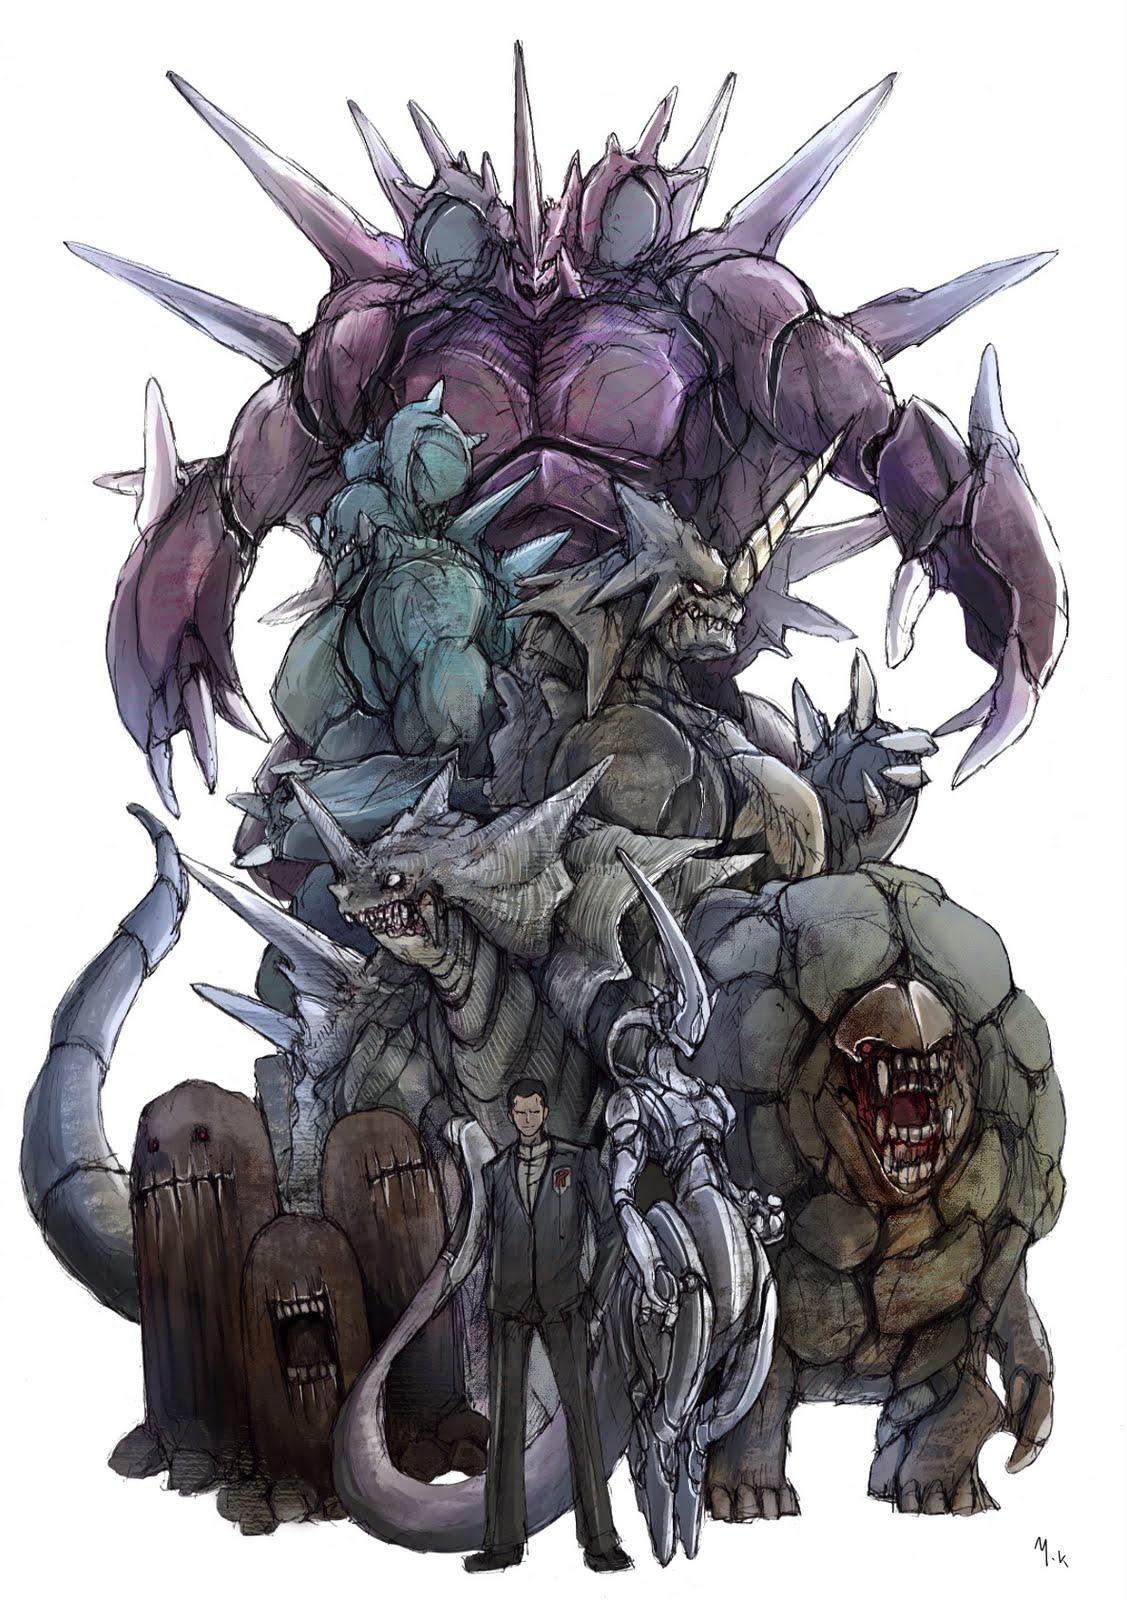 Some nice alternative art, i found about Pokemon, Seems pretty epic.